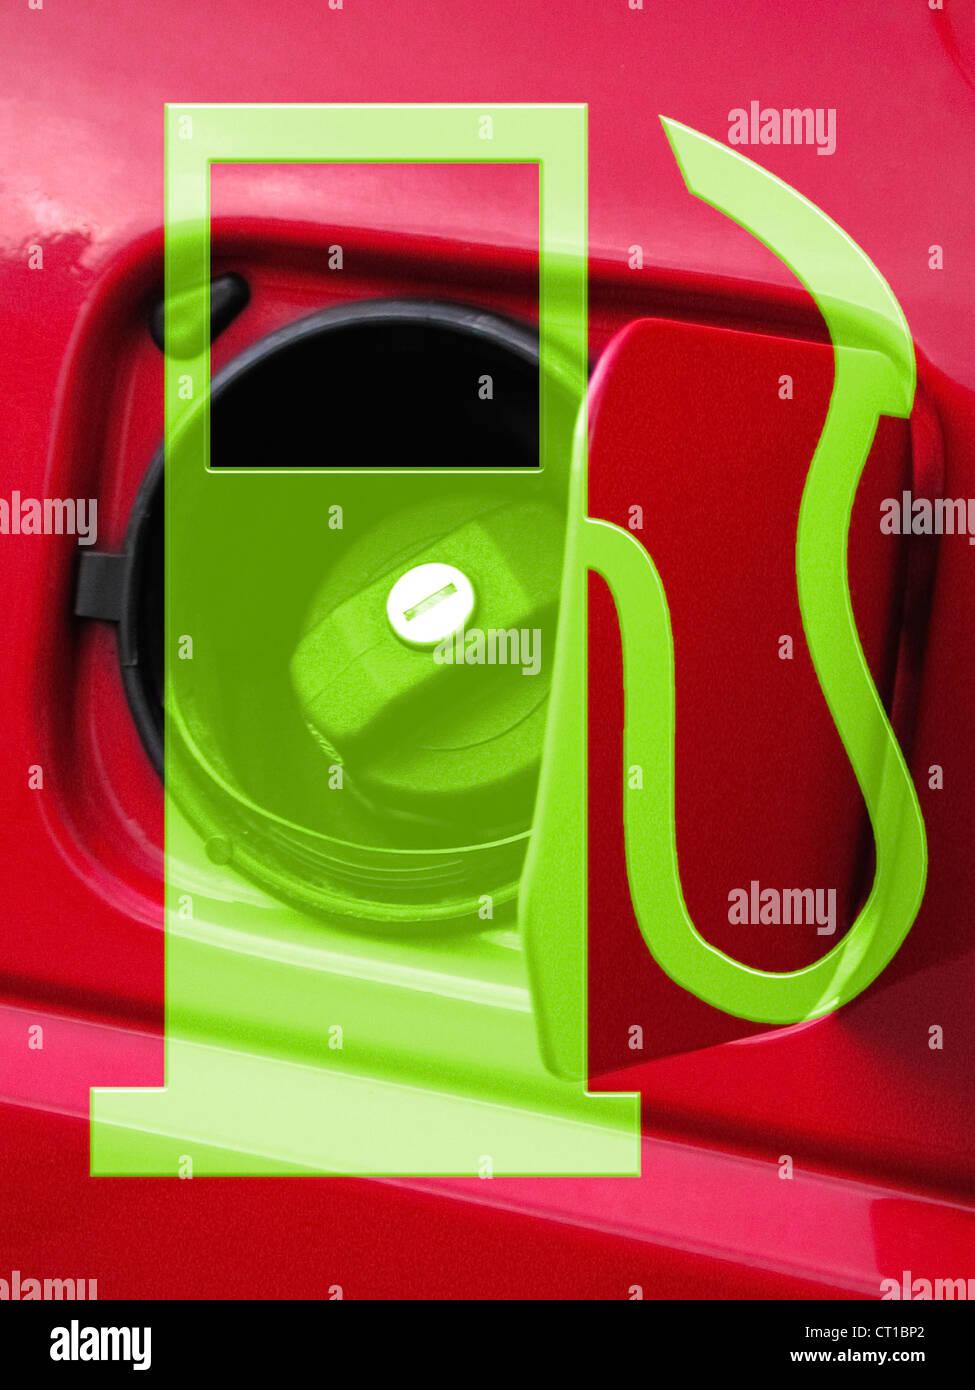 Symbol of a fuel nozzle in front of a fuel cap - Stock Image